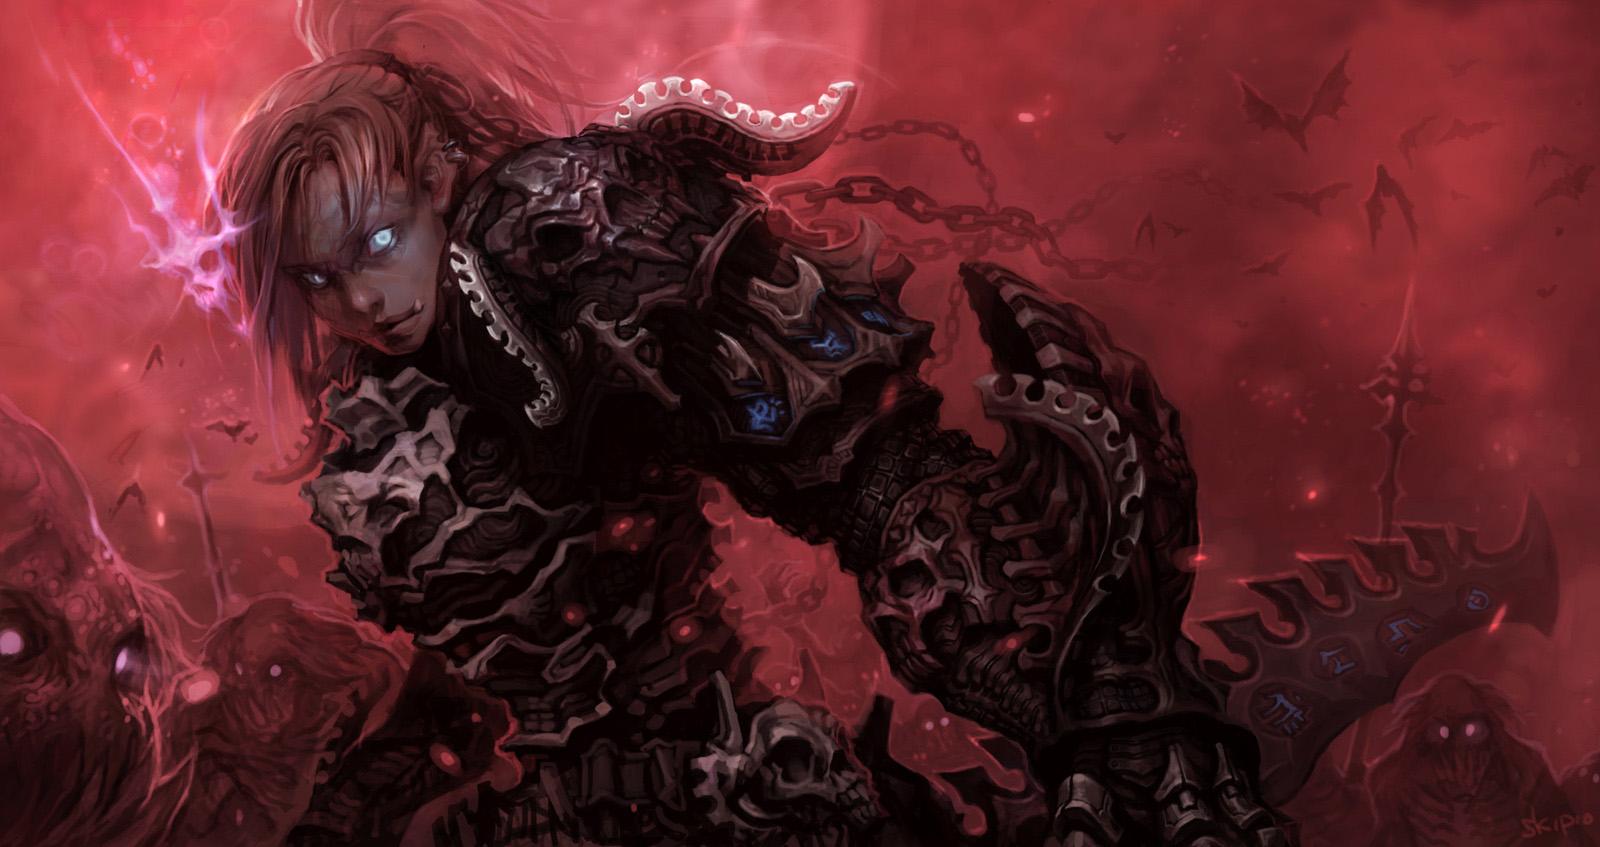 Orcs abuse girls xxx image